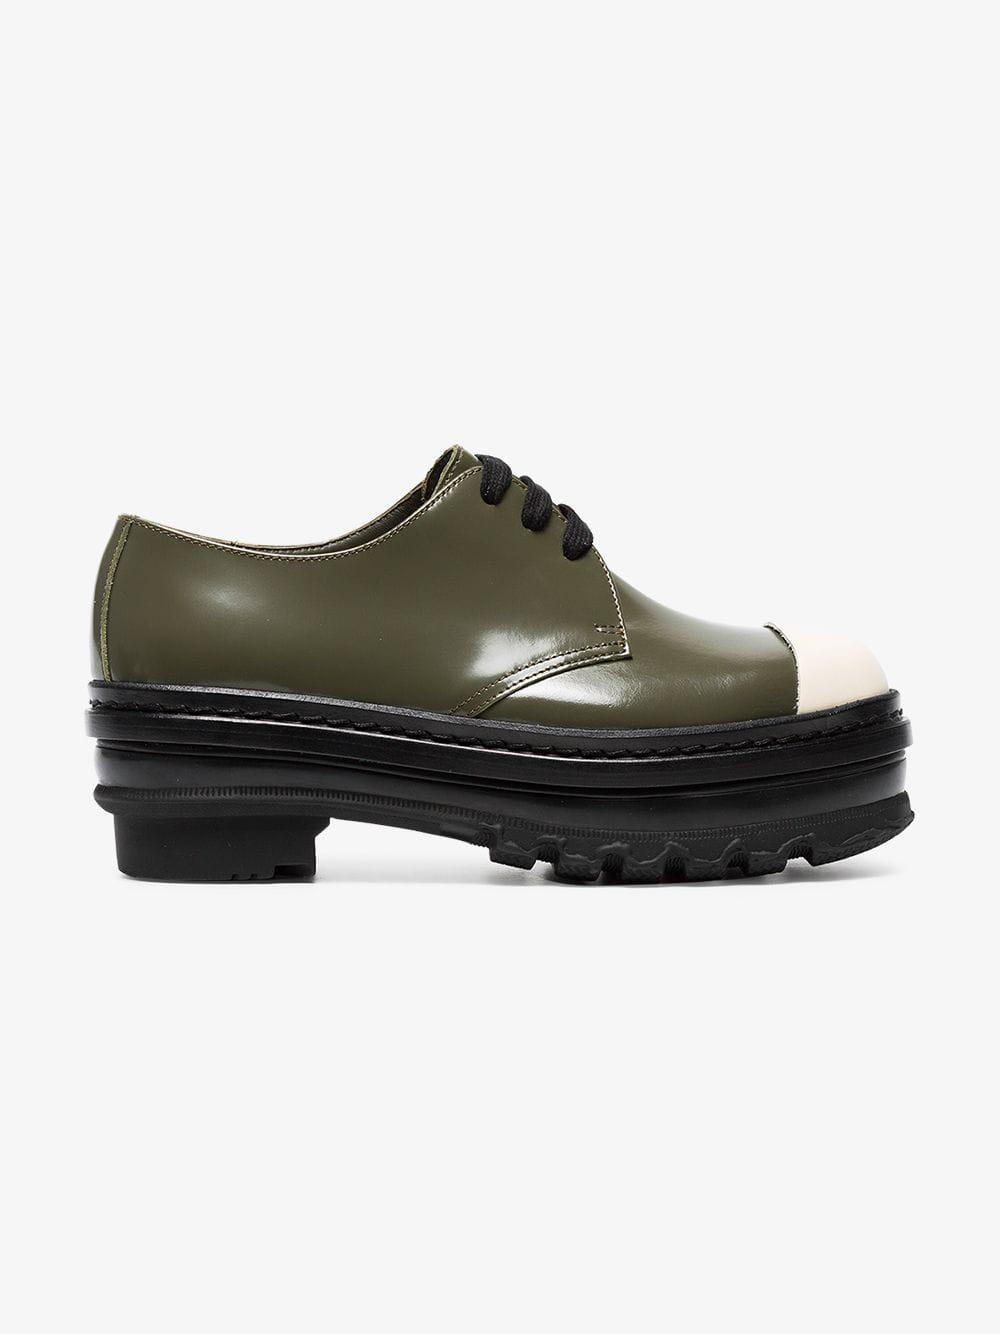 08582d0df15 Lyst - Marni Black Almsy 65 Flatform Leather Brogues in Green